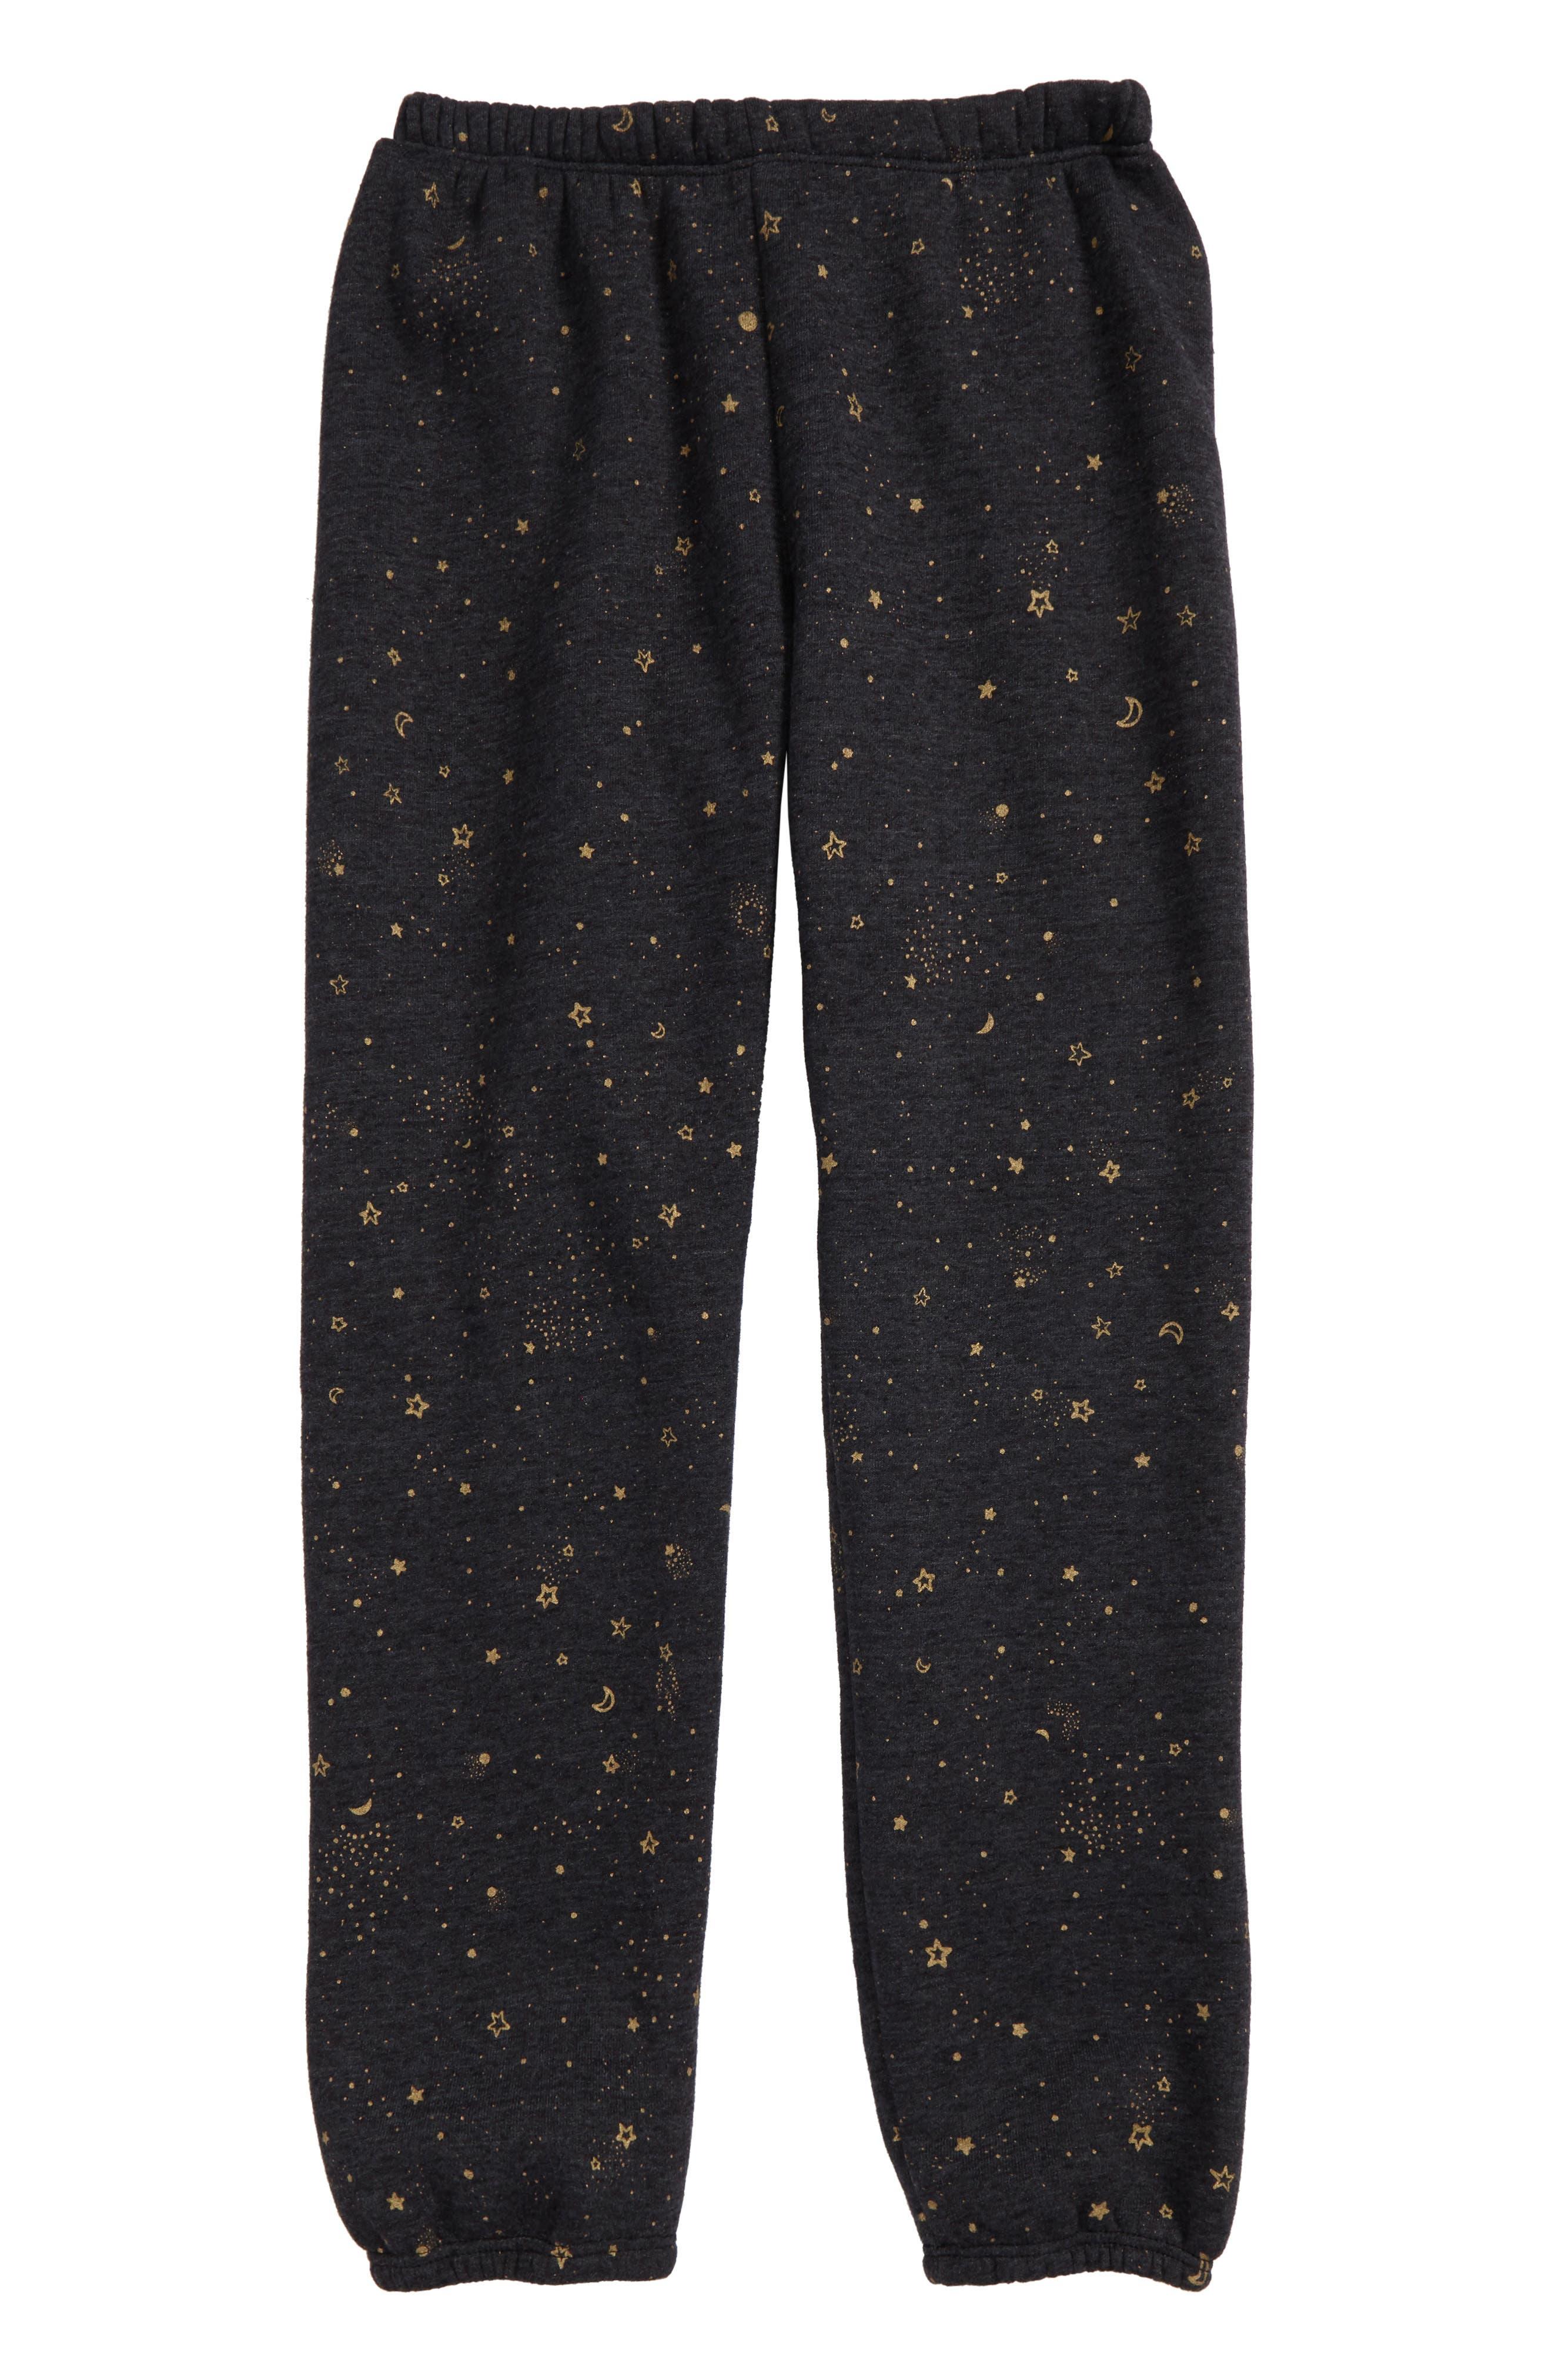 Stellar Print Sweatpants,                             Main thumbnail 1, color,                             003